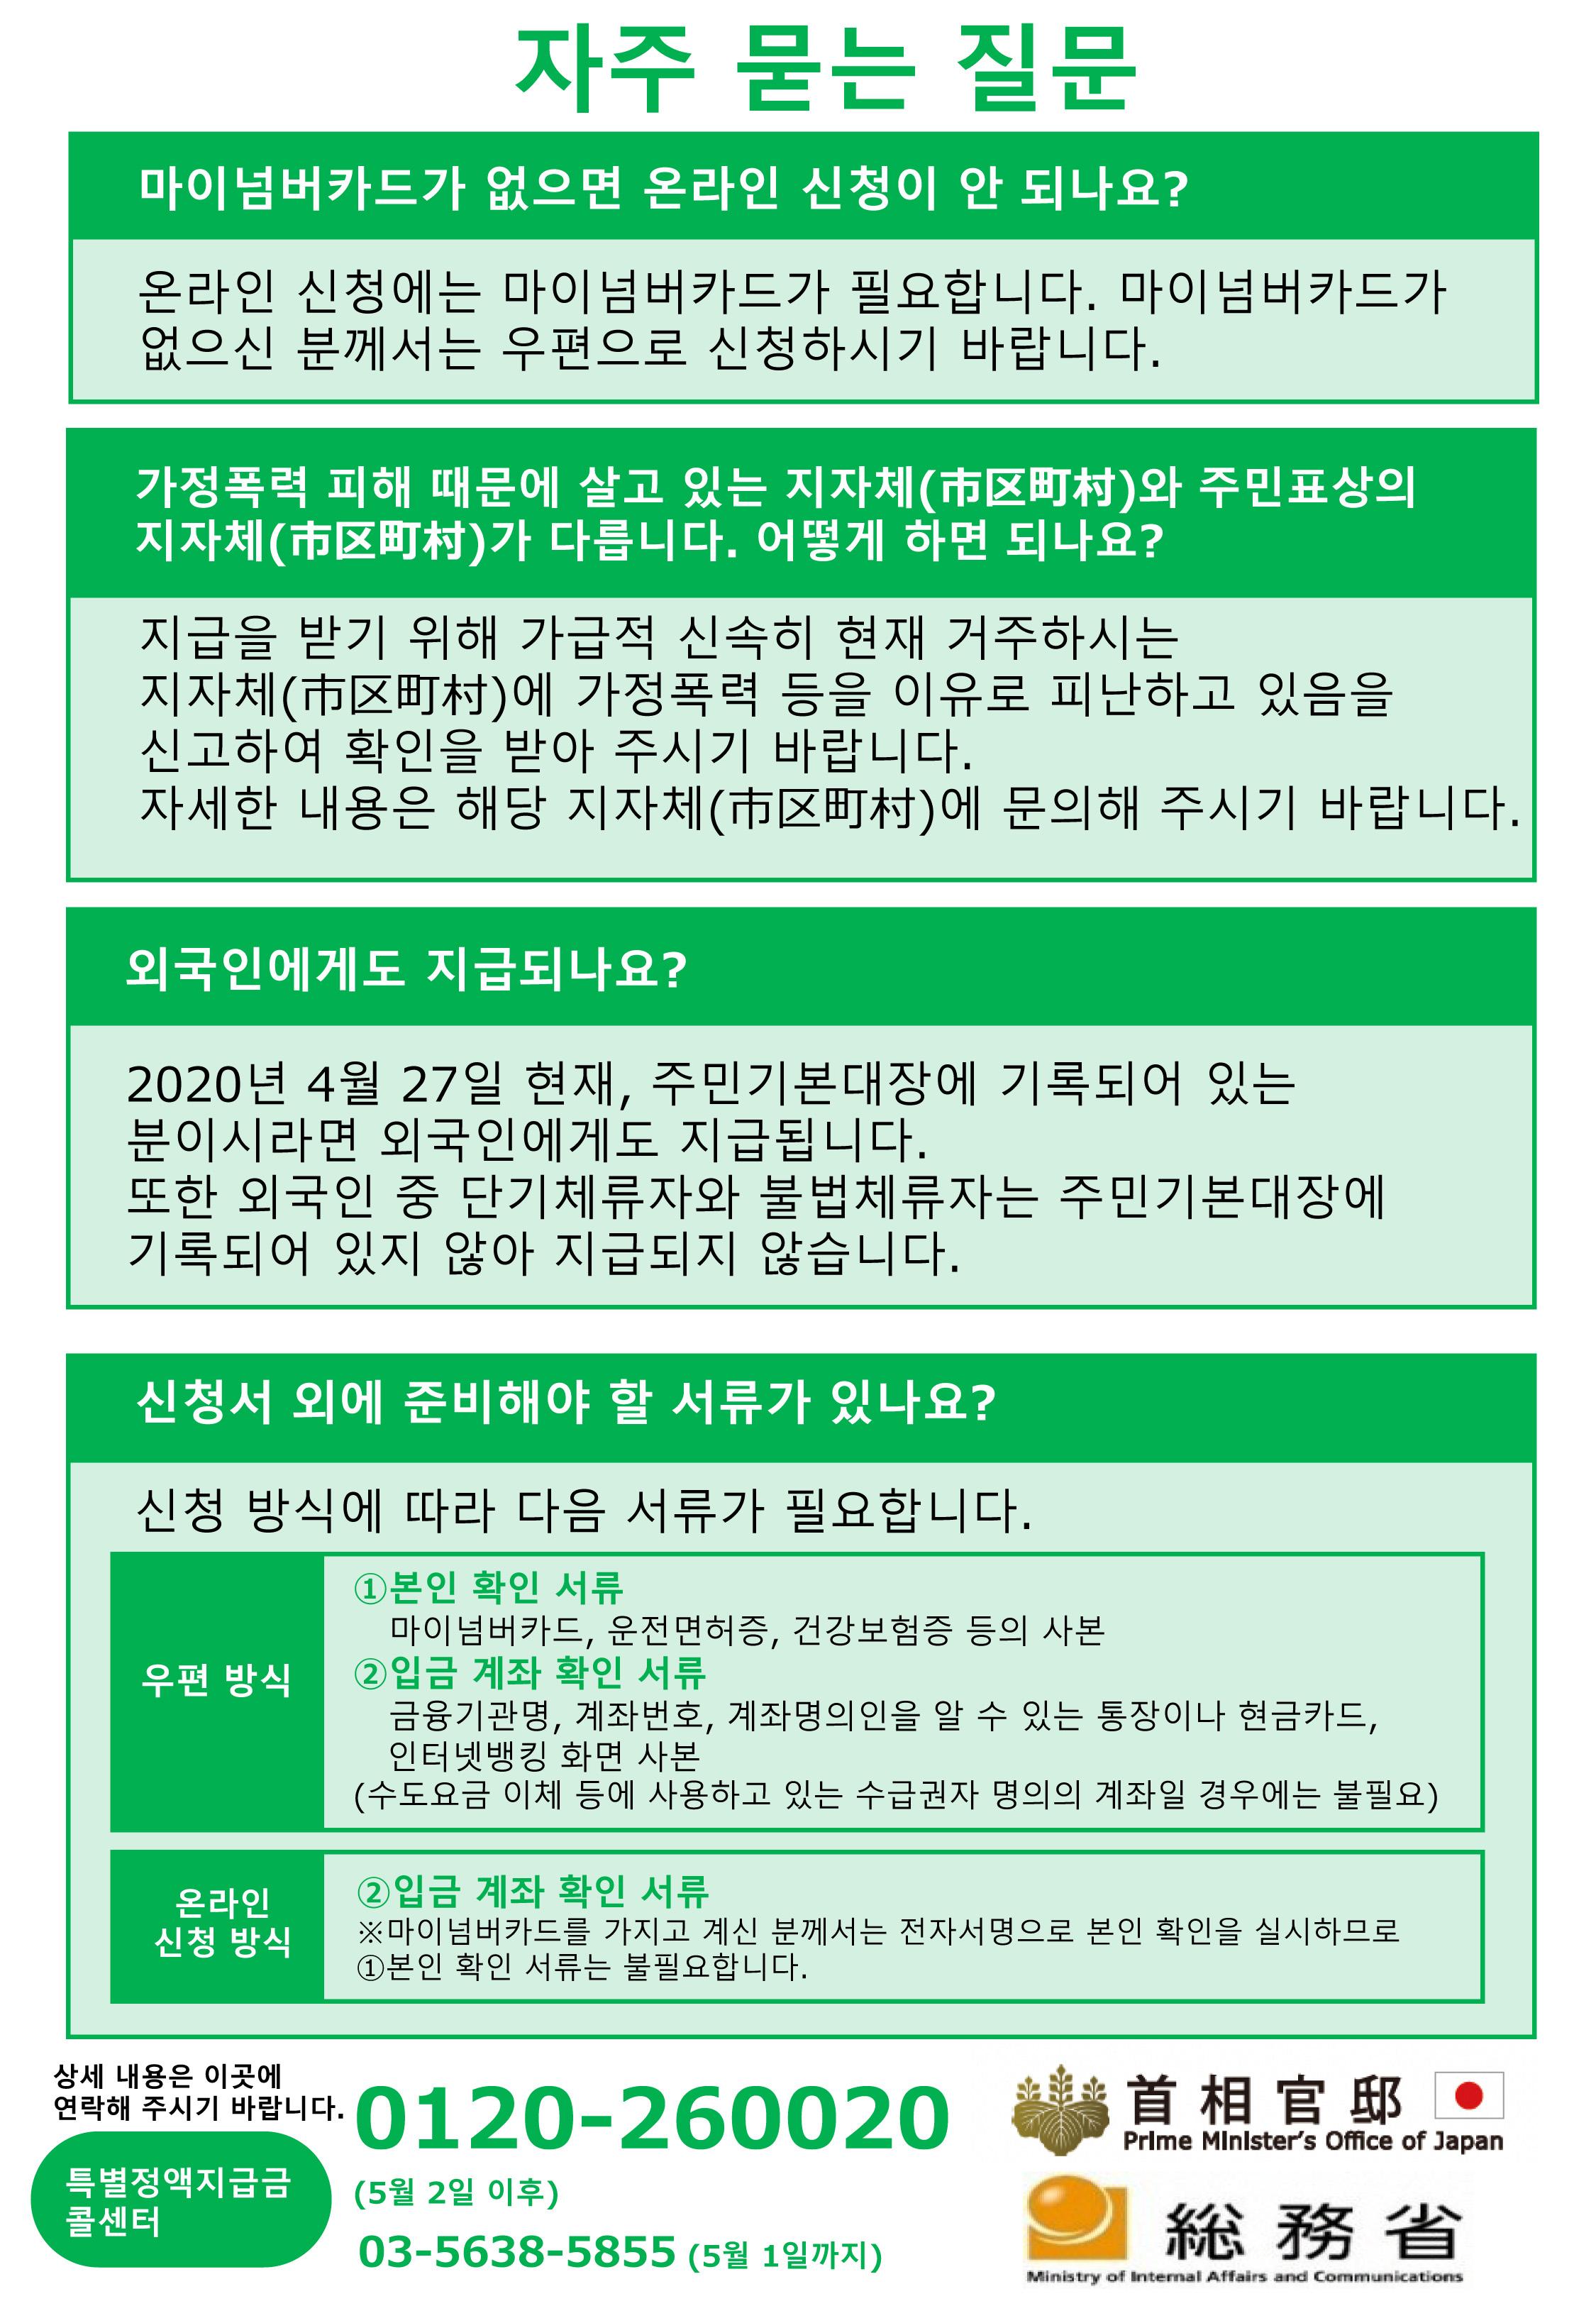 (5)特別定額給付金のご案内(韓国語版)-2